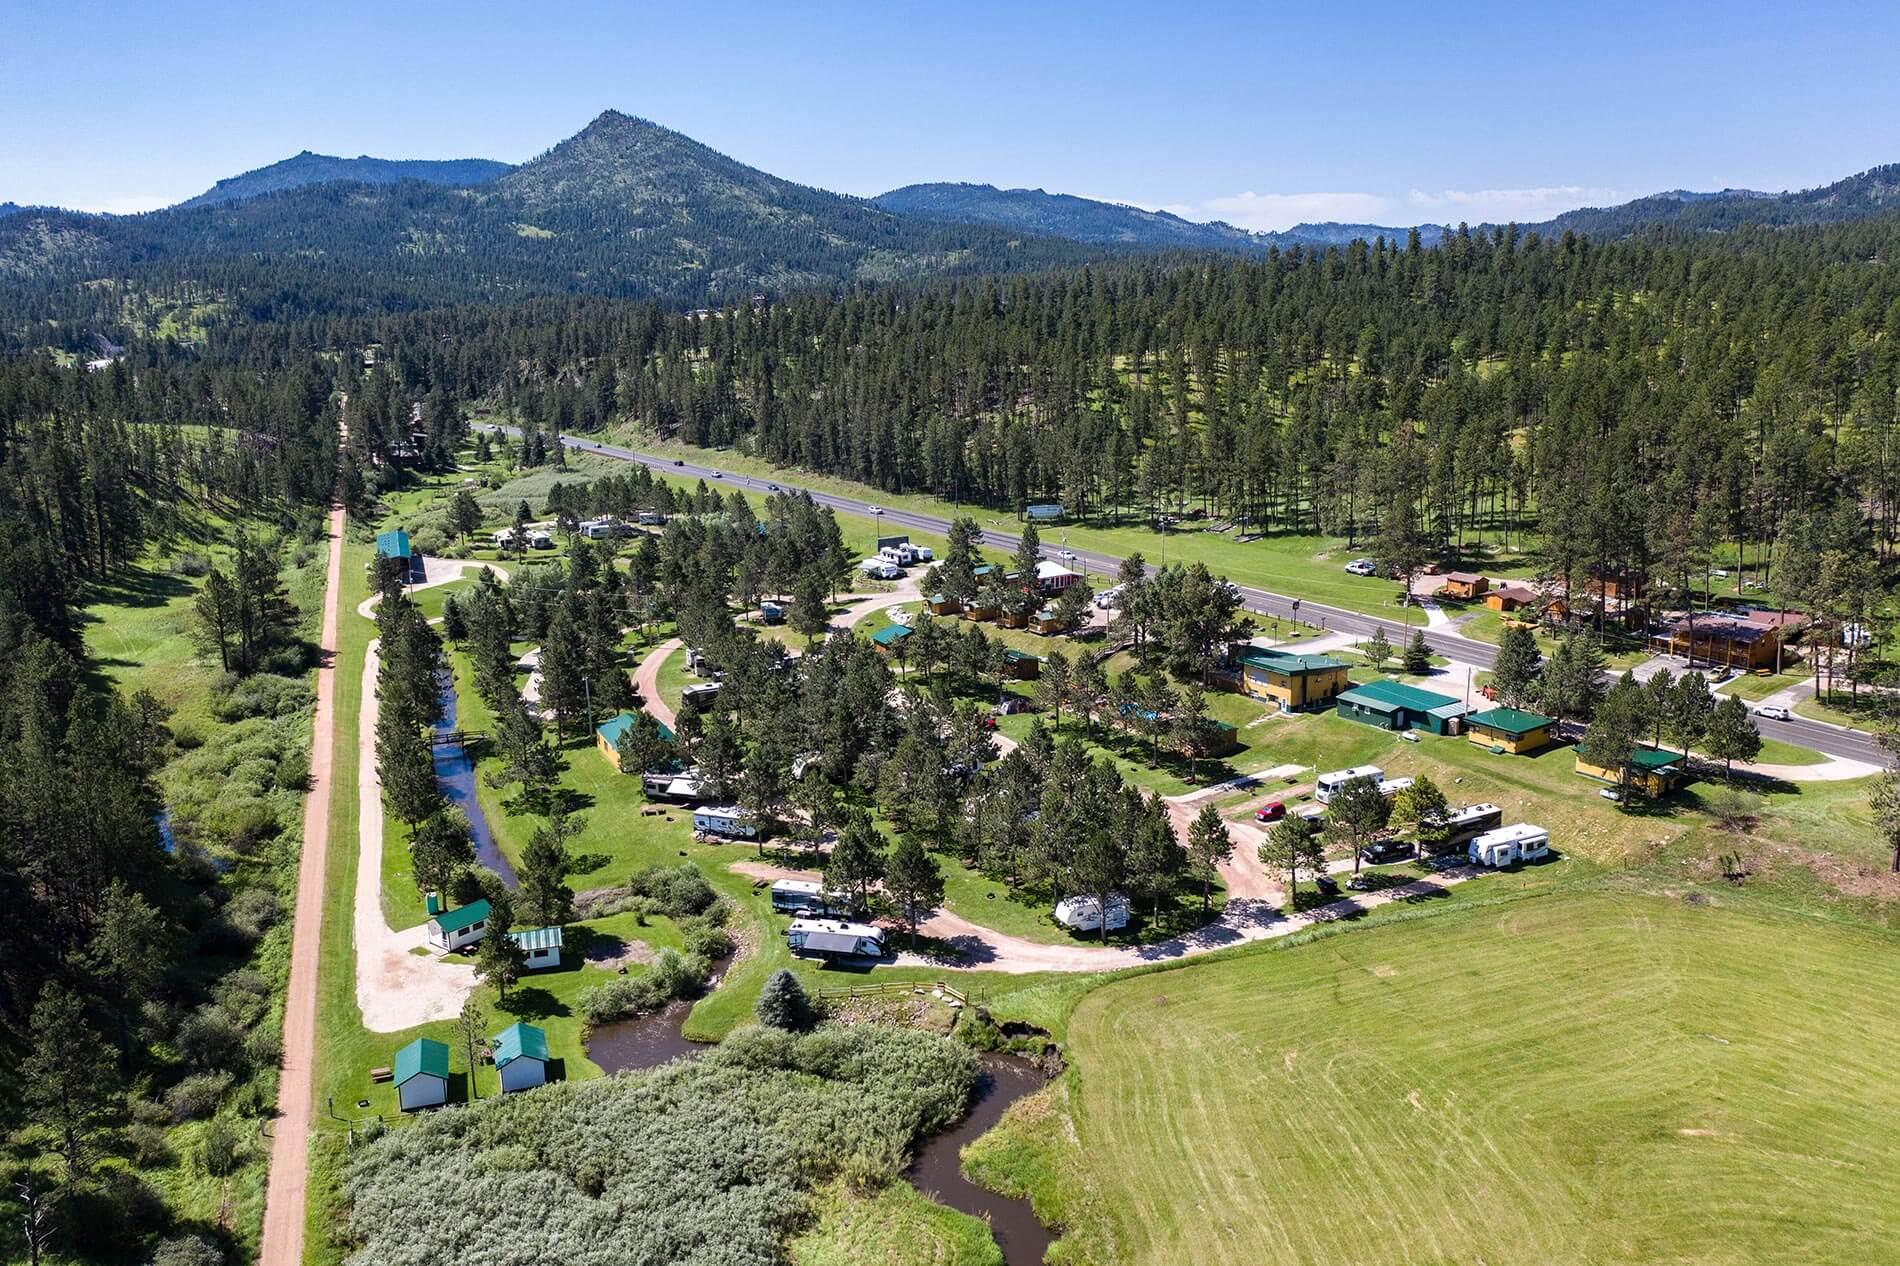 Larsson's Crooked Creek Resort